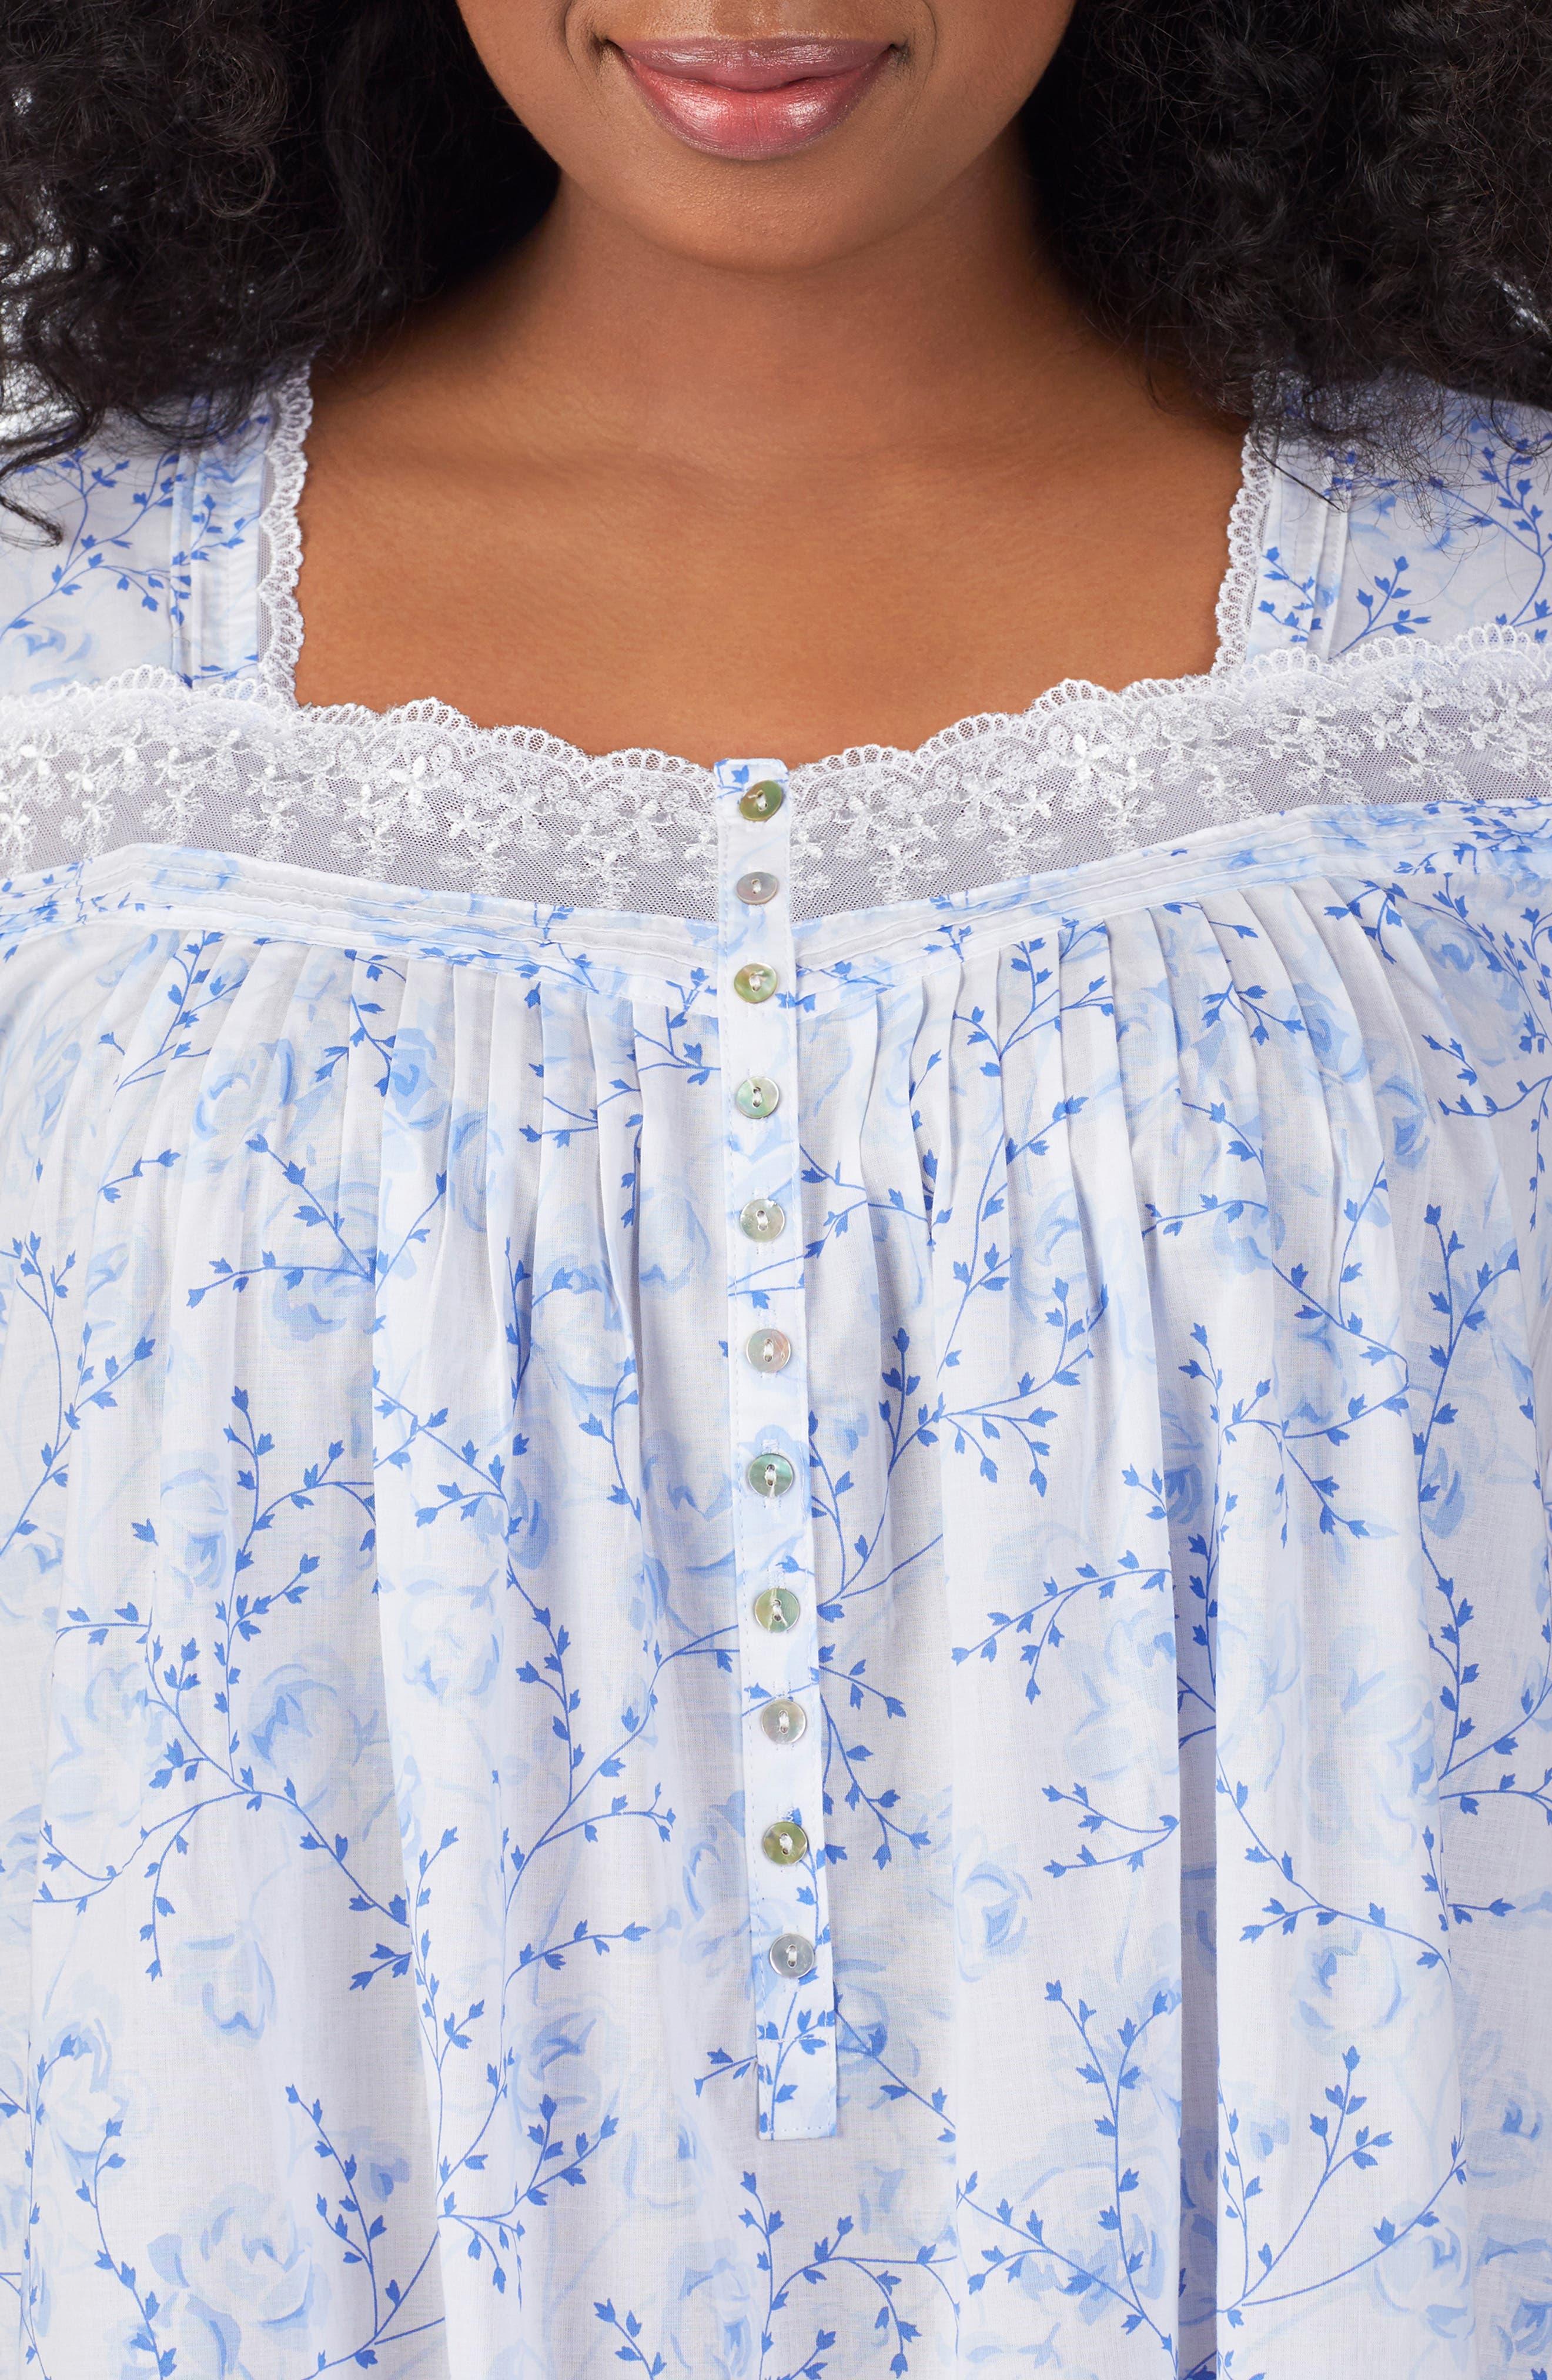 Cotton Lawn Nightgown,                             Alternate thumbnail 3, color,                             BLUE FLORAL